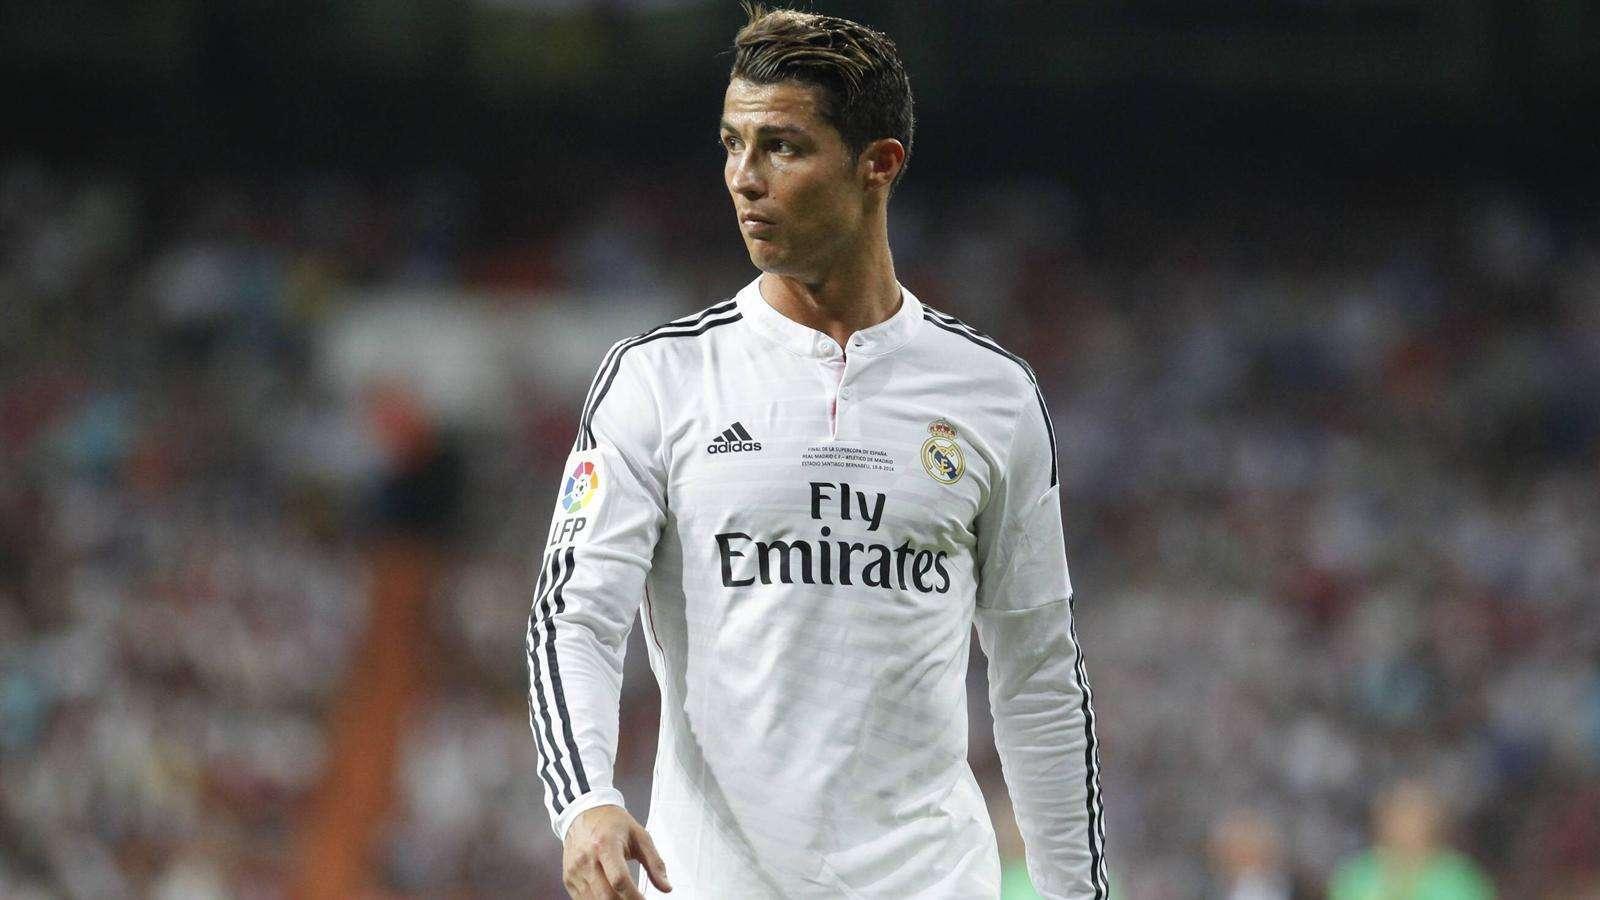 Ronaldo Photo 2015 | Search Results | Calendar 2015